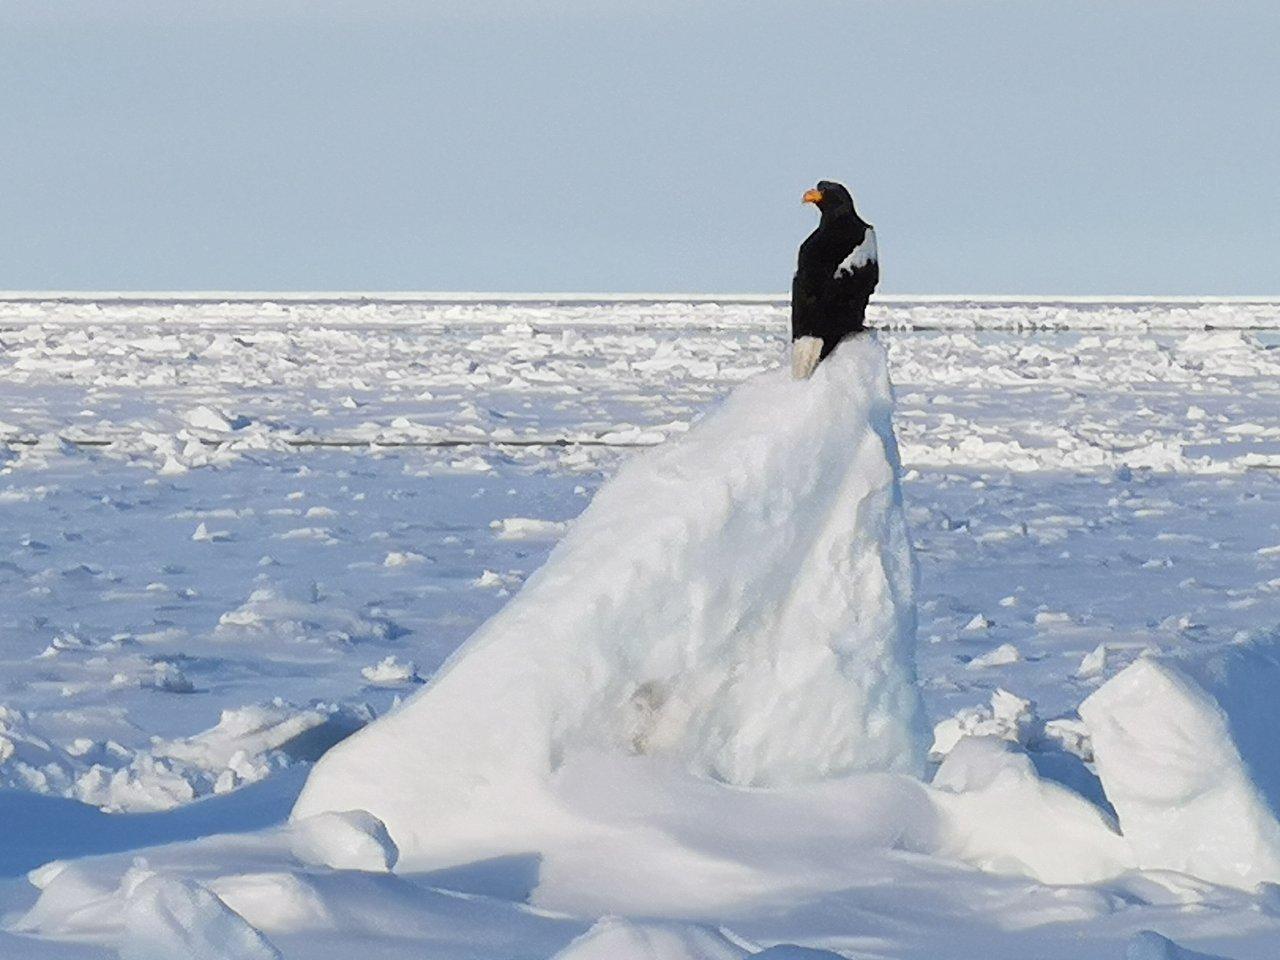 Drift ice observation